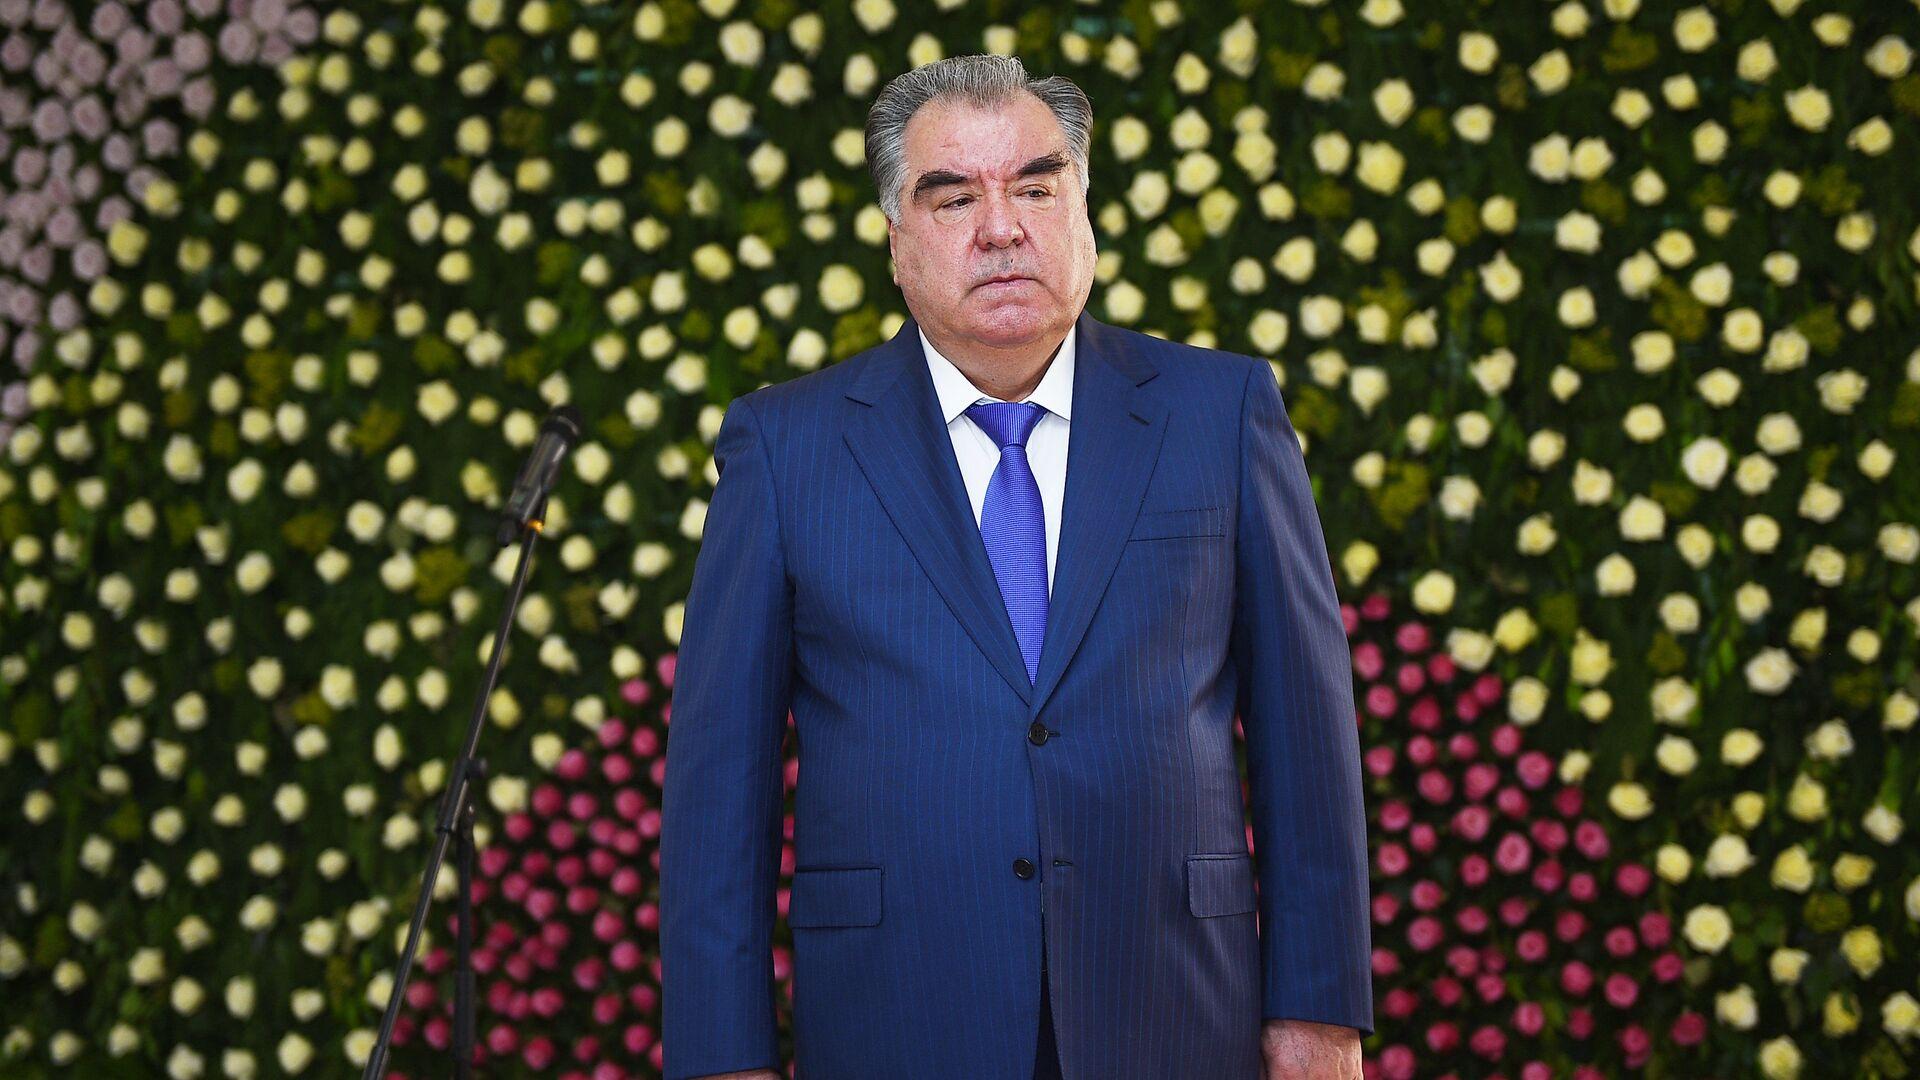 Президент Республики Таджикистан Эмомали Рахмон - Sputnik Таджикистан, 1920, 19.07.2021